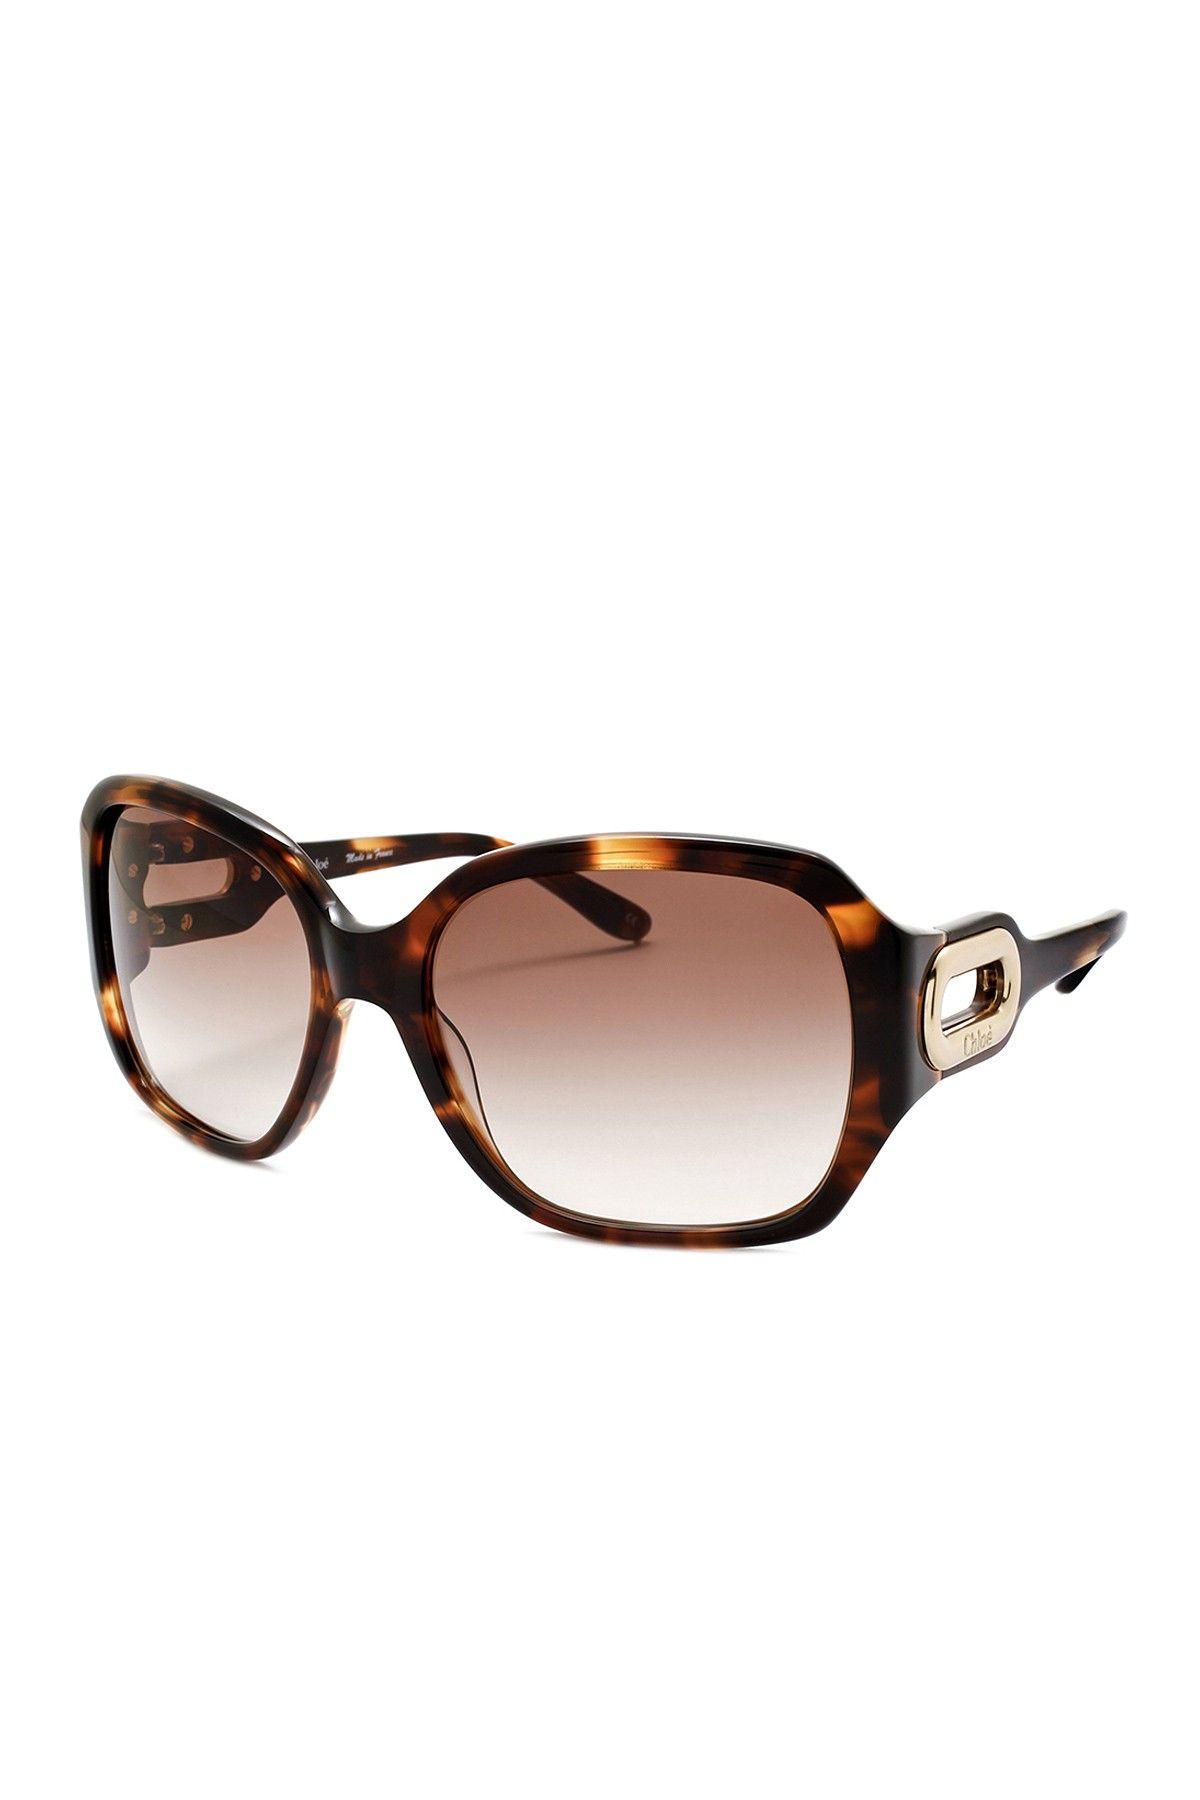 Designer Sunglasses SALE: Chloe